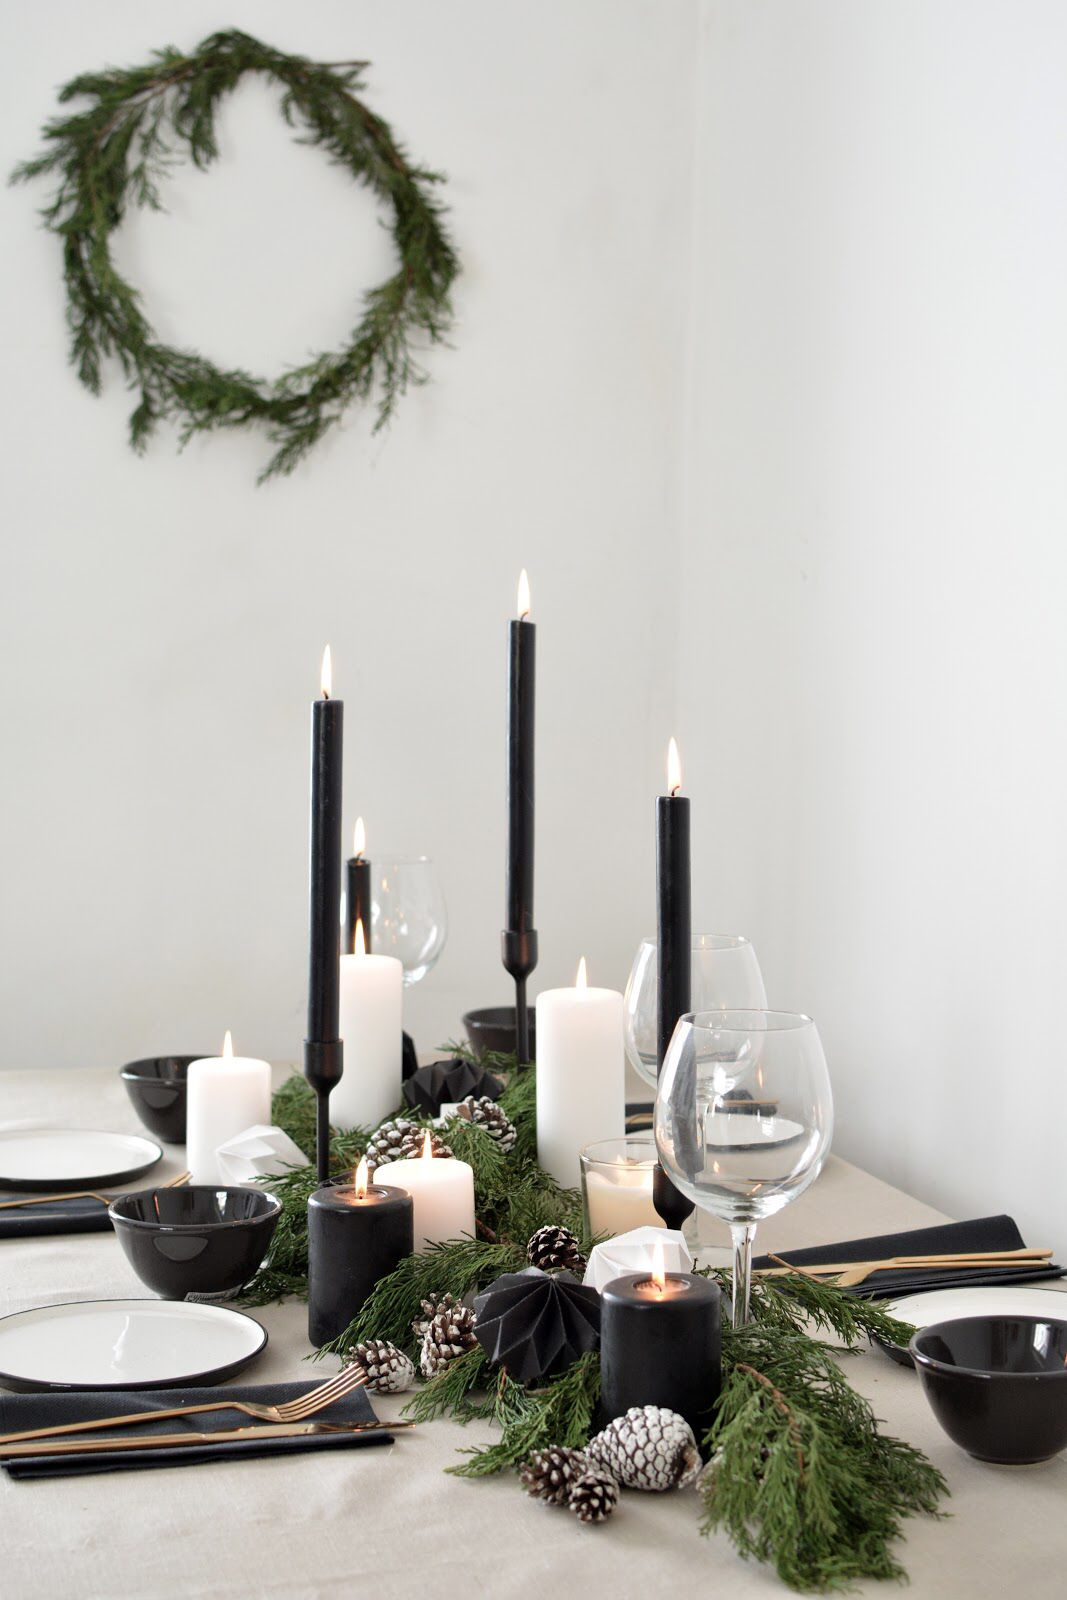 10 Scandinavian Christmas Decoration Ideas For Your Home Simple Christmas Decor Scandinavian Christmas Decorations Alternative Christmas Tree